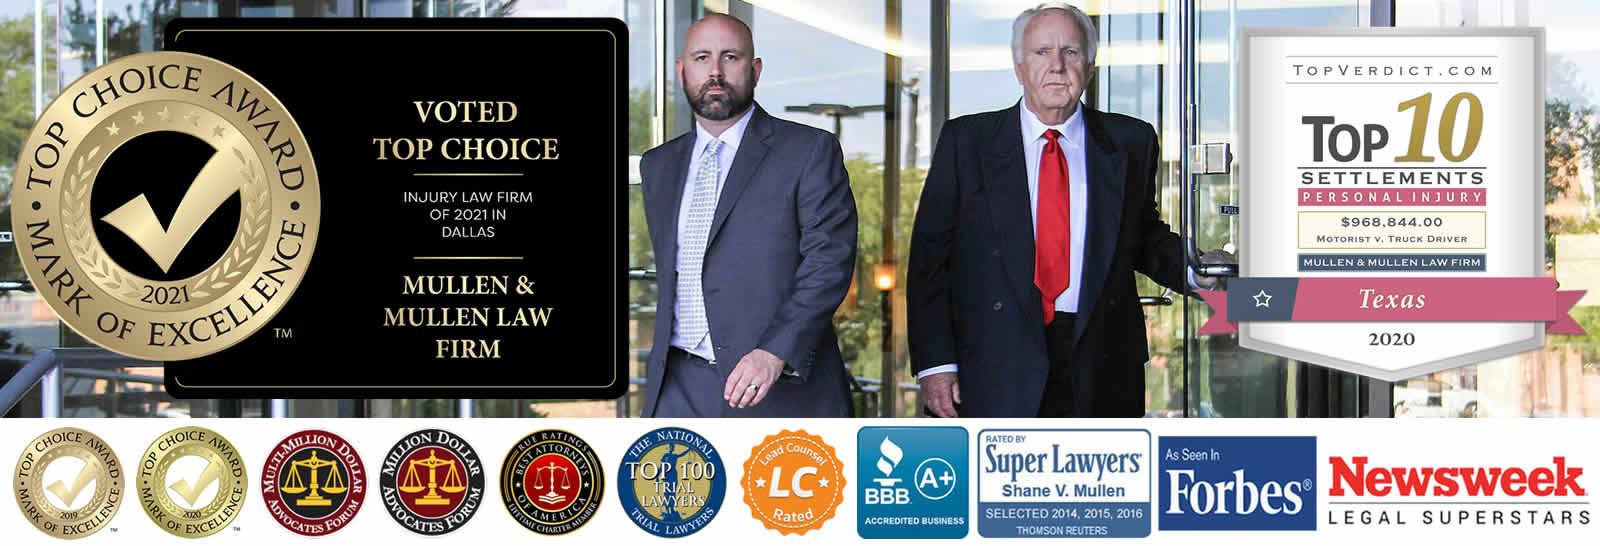 Mullen & Mullen Law Firm: Dallas Personal Injury Attorneys